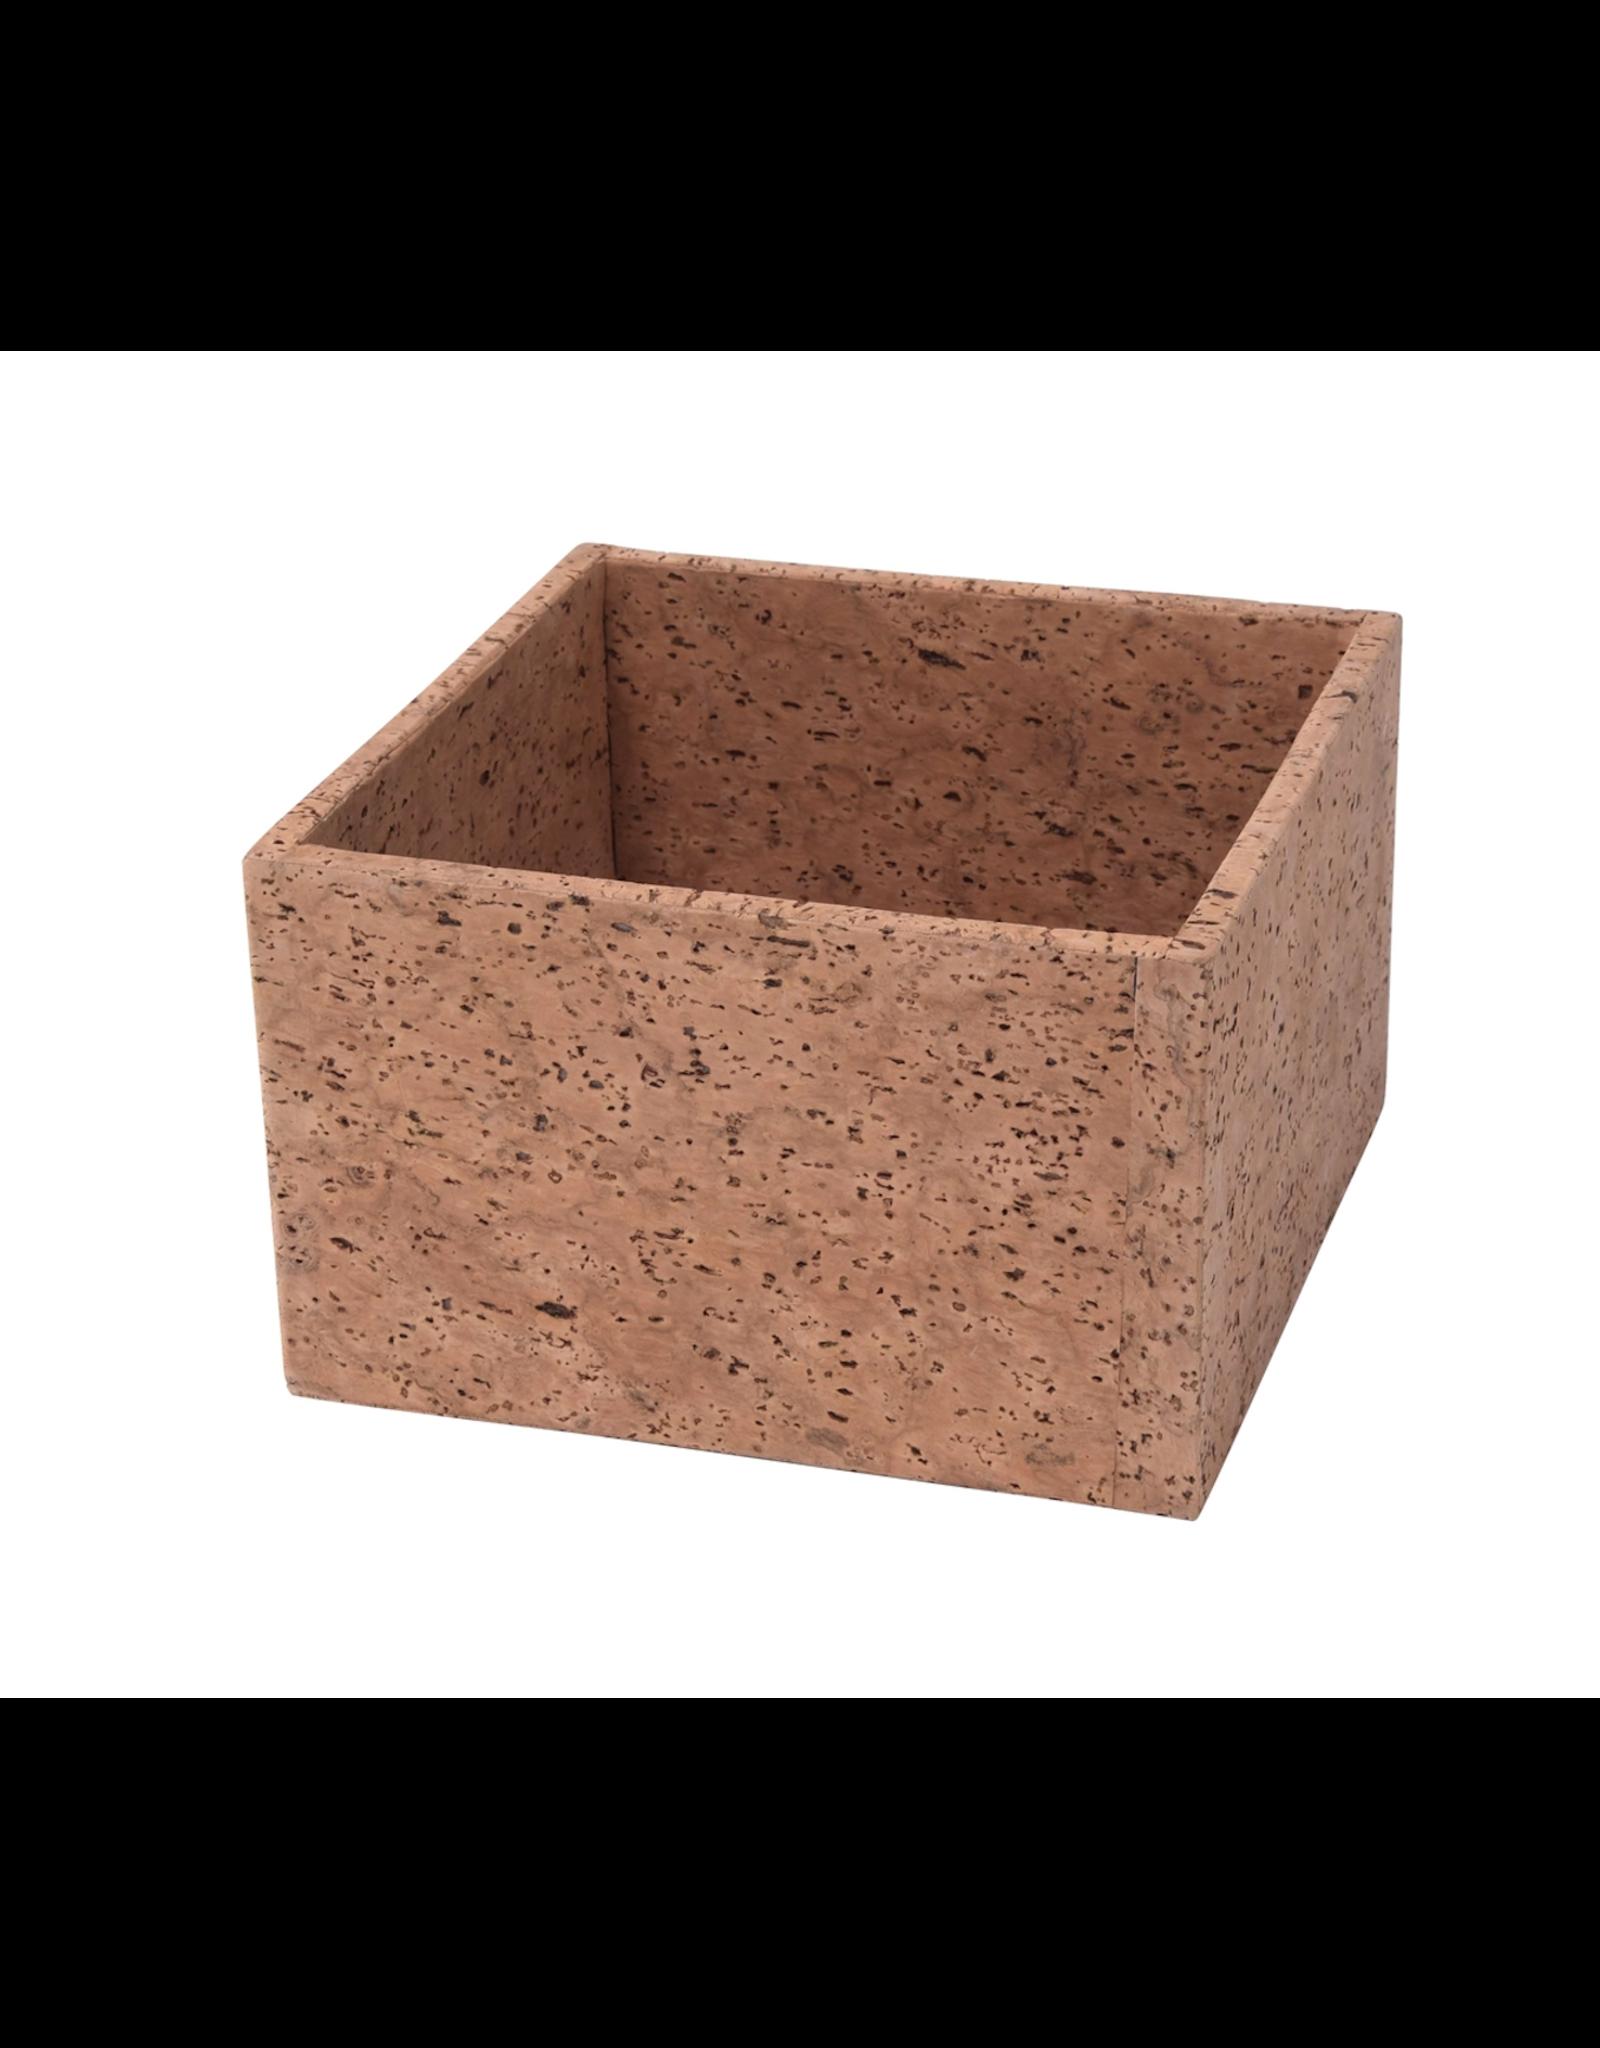 BIDK Cork Square Box